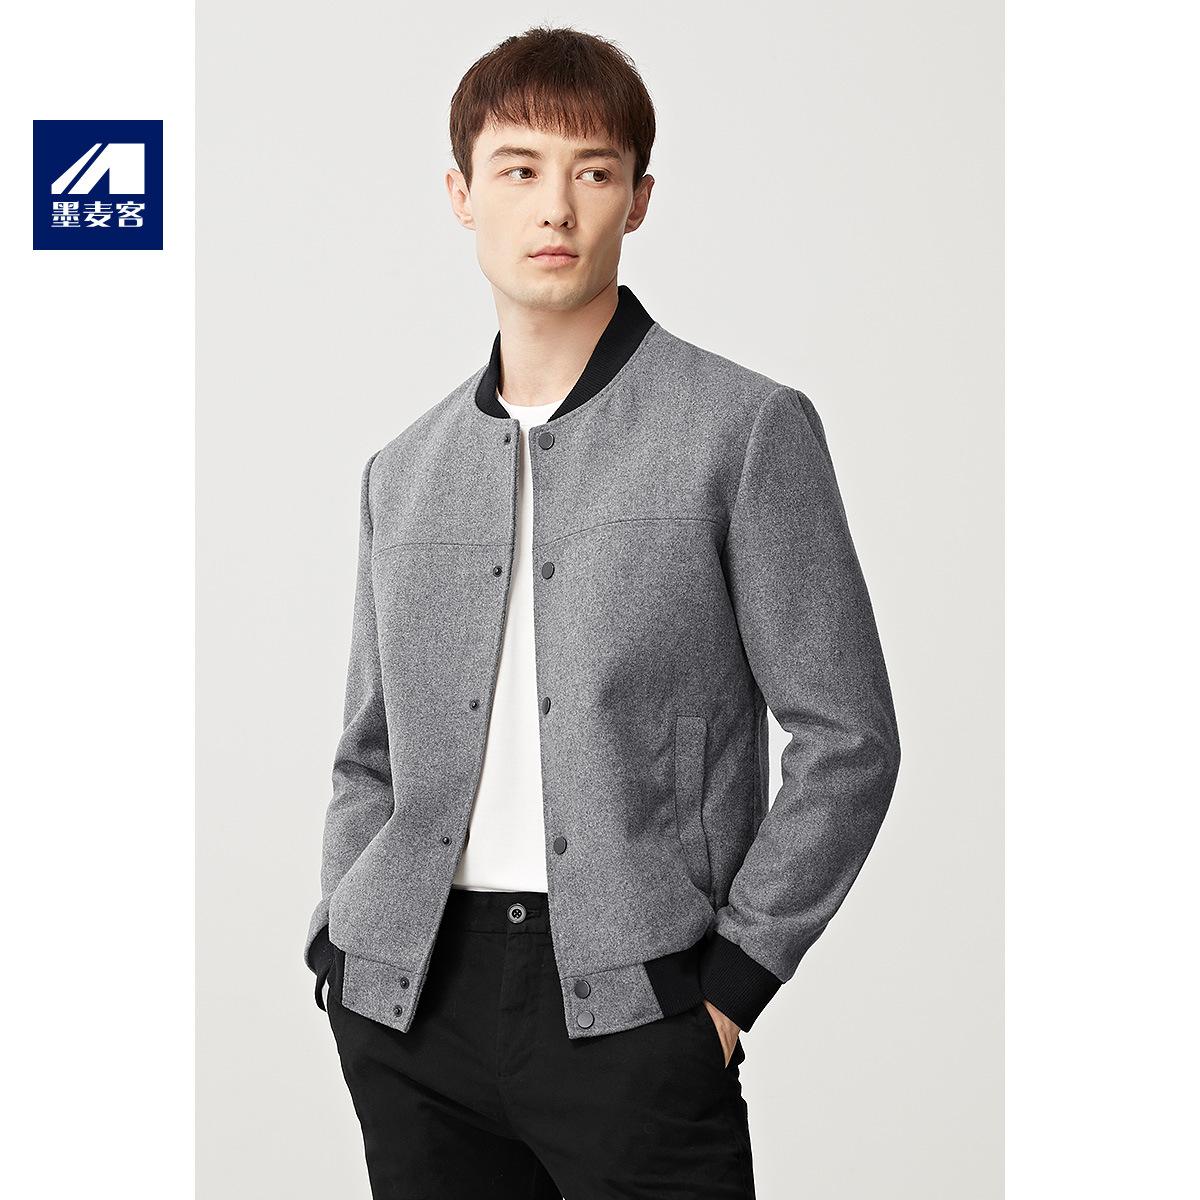 Baseball collar jacket autumn summer mens contrast sports casual coat wool cardigan brand button grey Long Sleeve Shirt